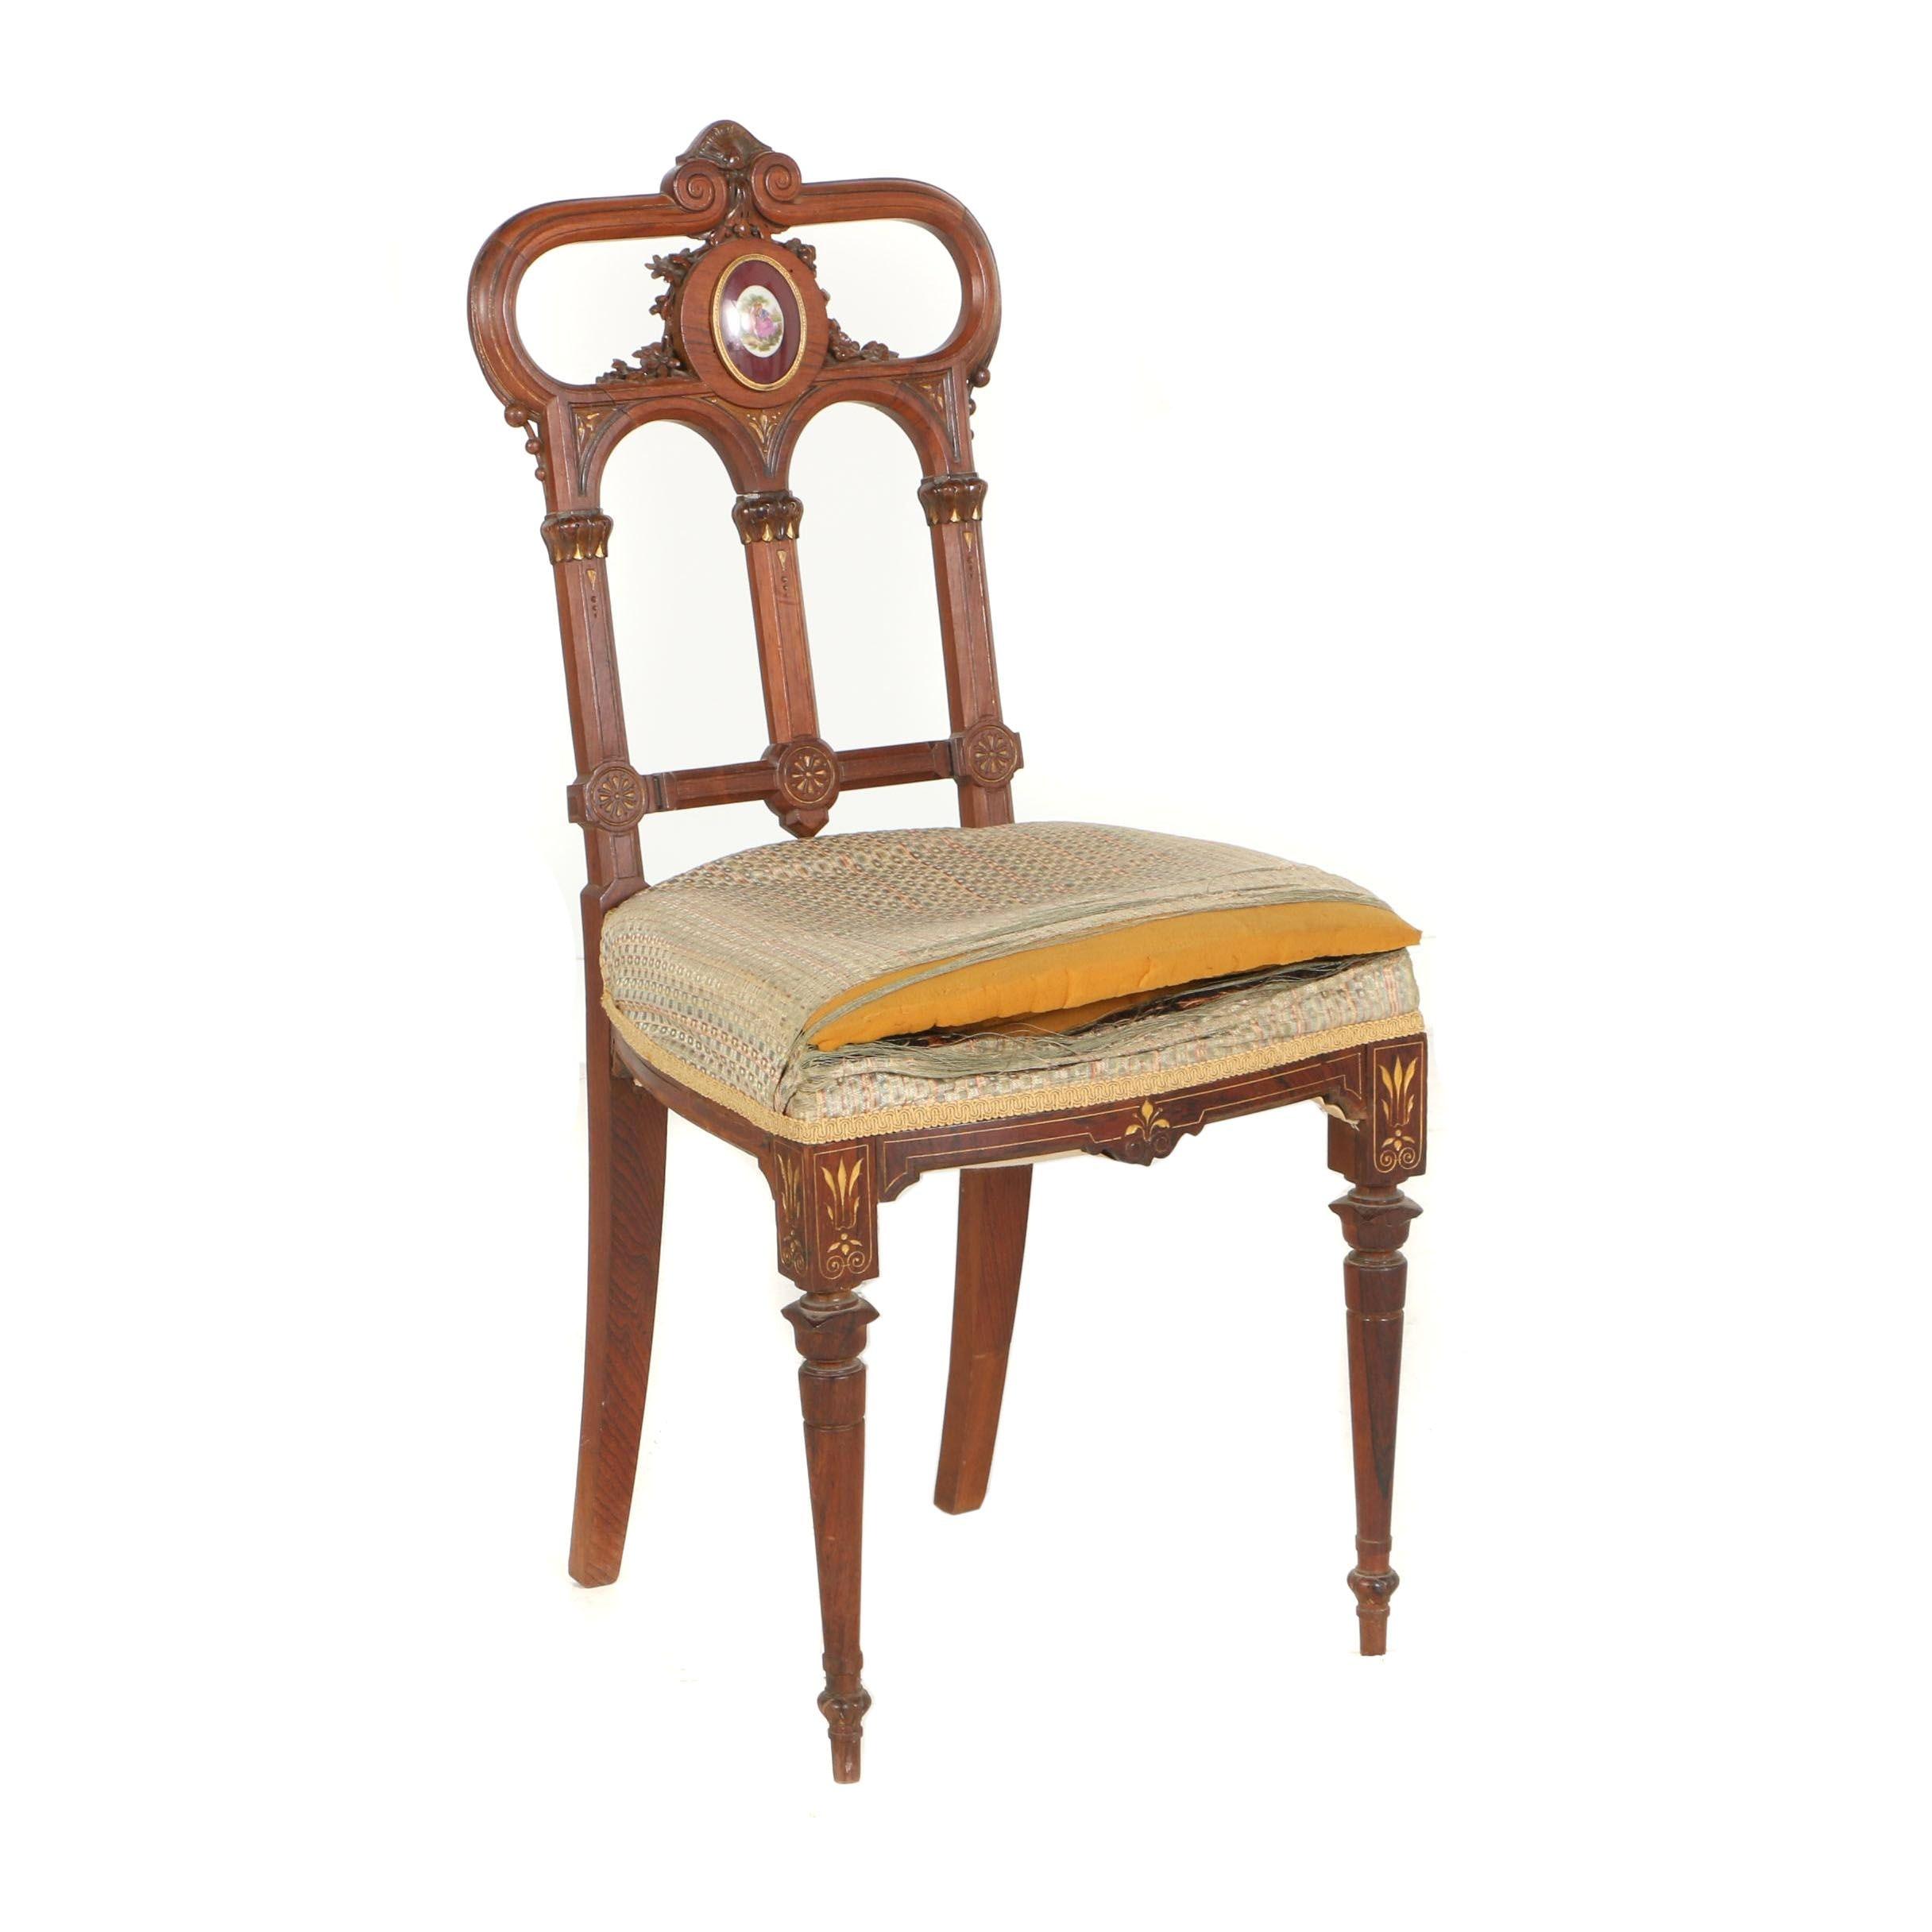 Renaissance Revival Parcel-Gilt and Porcelain-Mounted Rosewood Parlor Chair